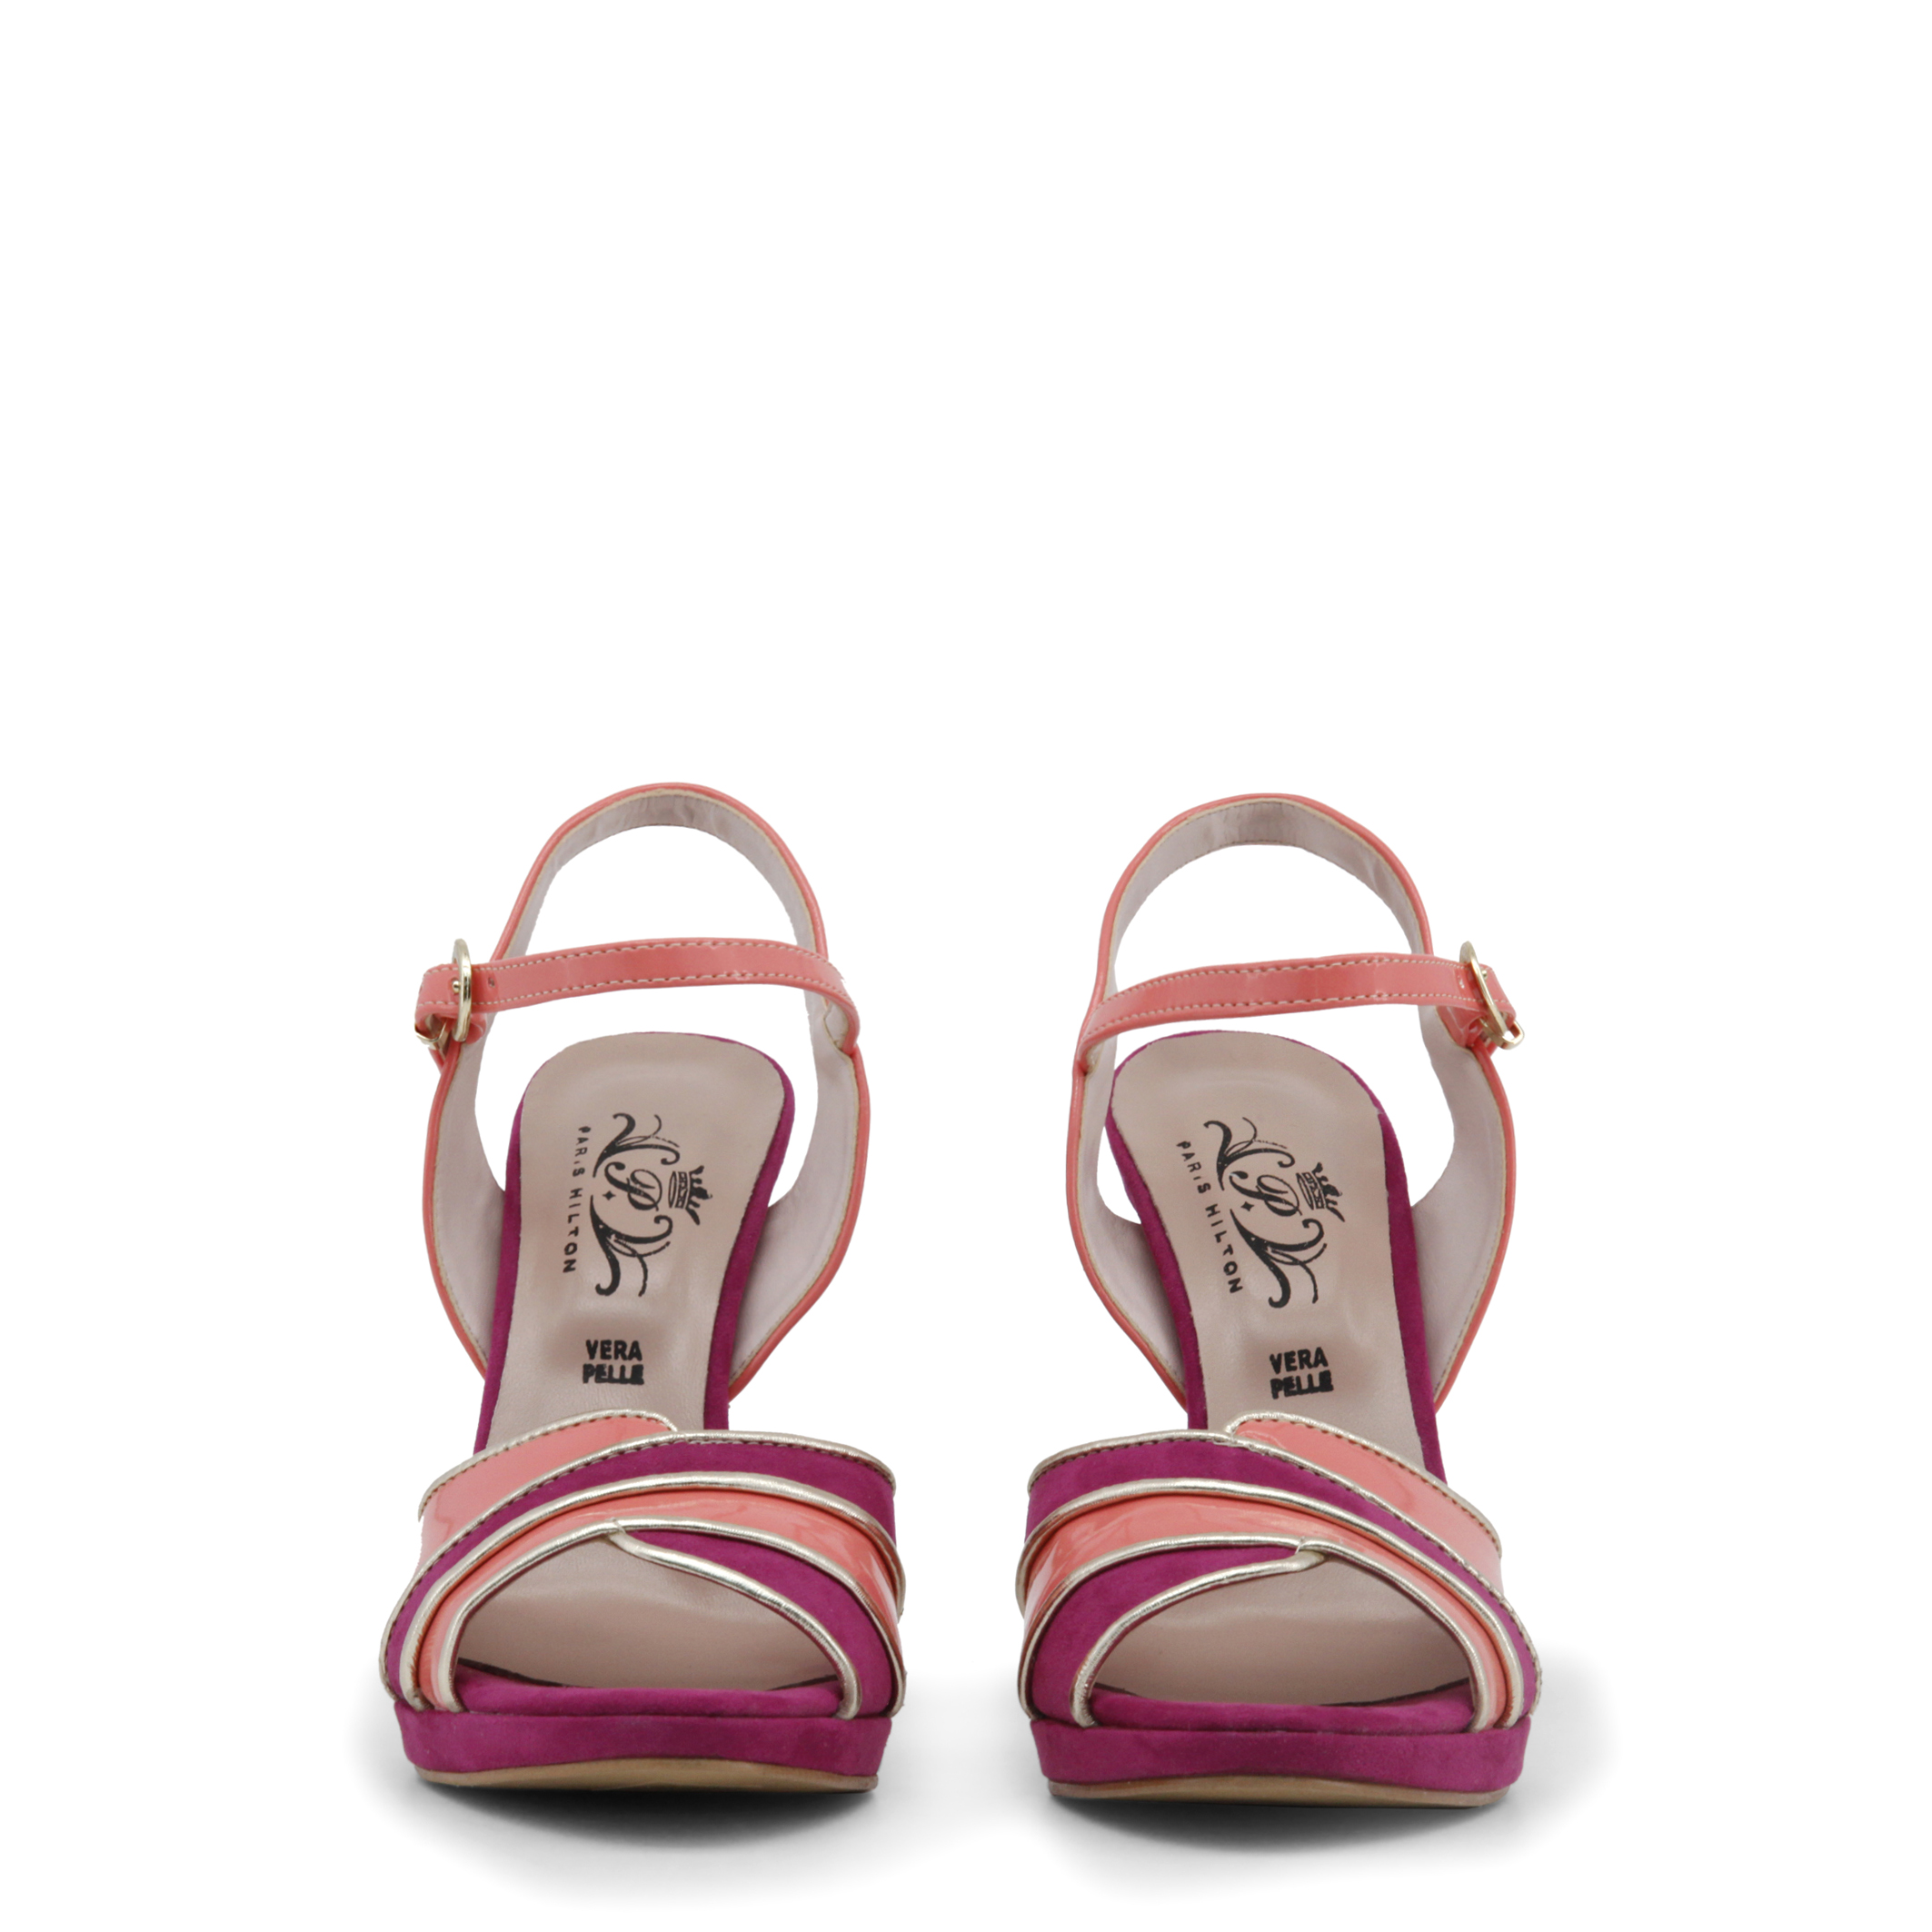 988f51d805cb3e Paris-Hilton-Women-Sandals-8605-Pink thumbnail 6